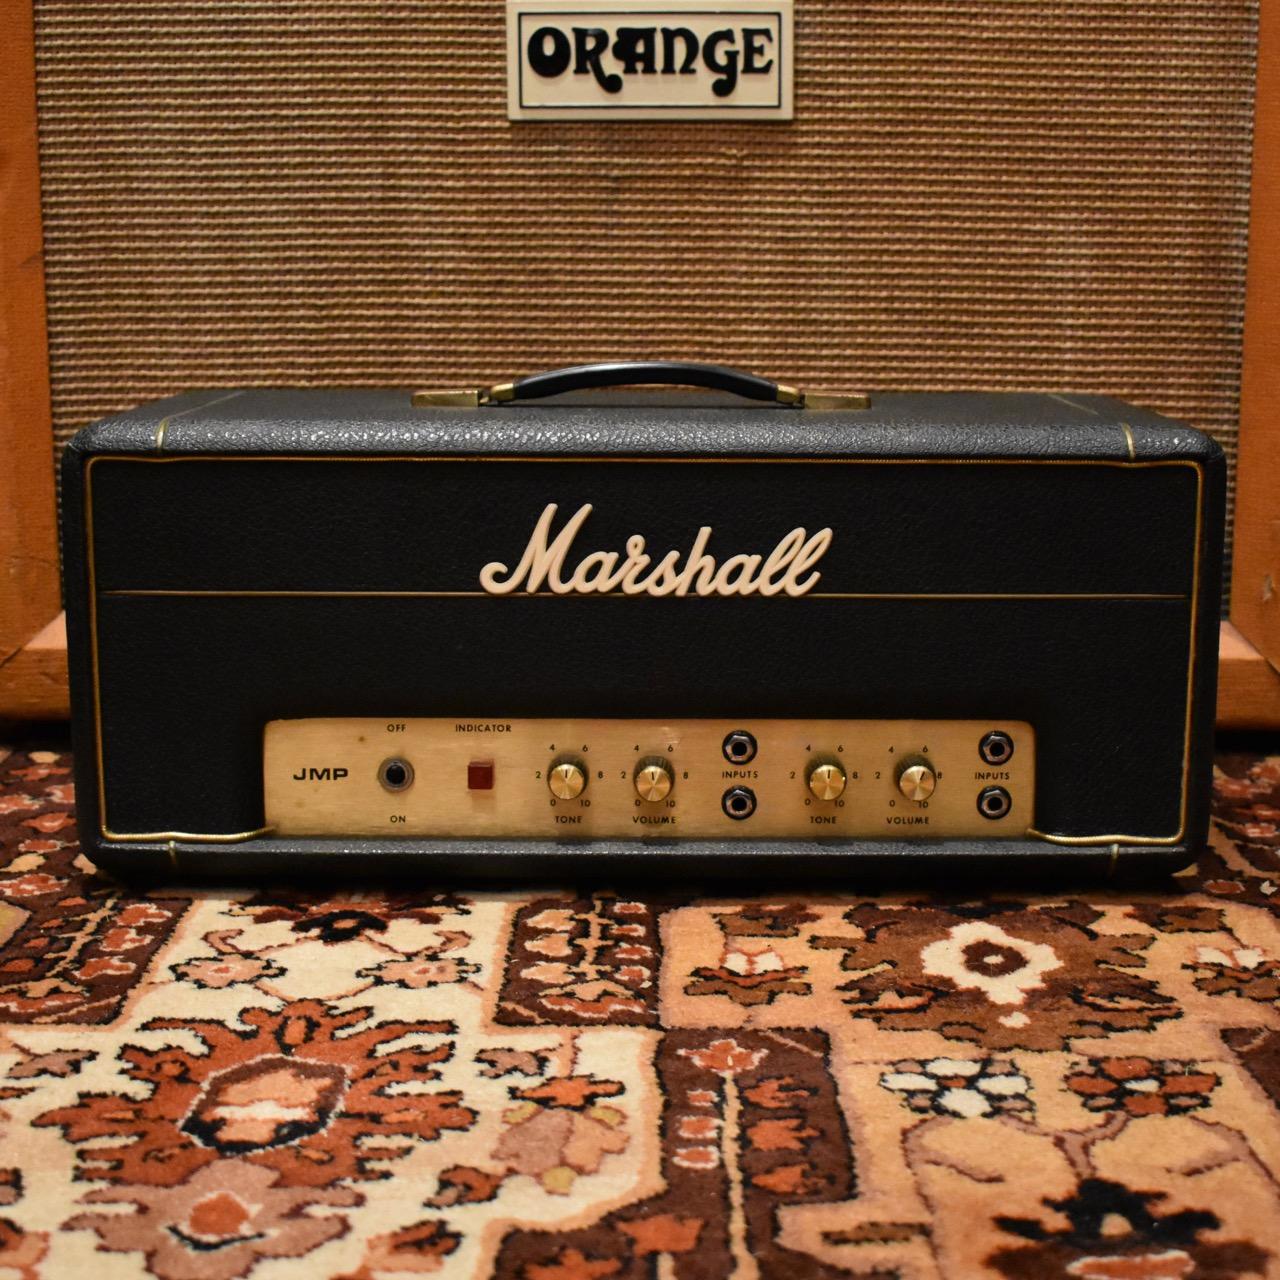 Vintage 1973 Marshall JMP PA 20 Valve Amplifier